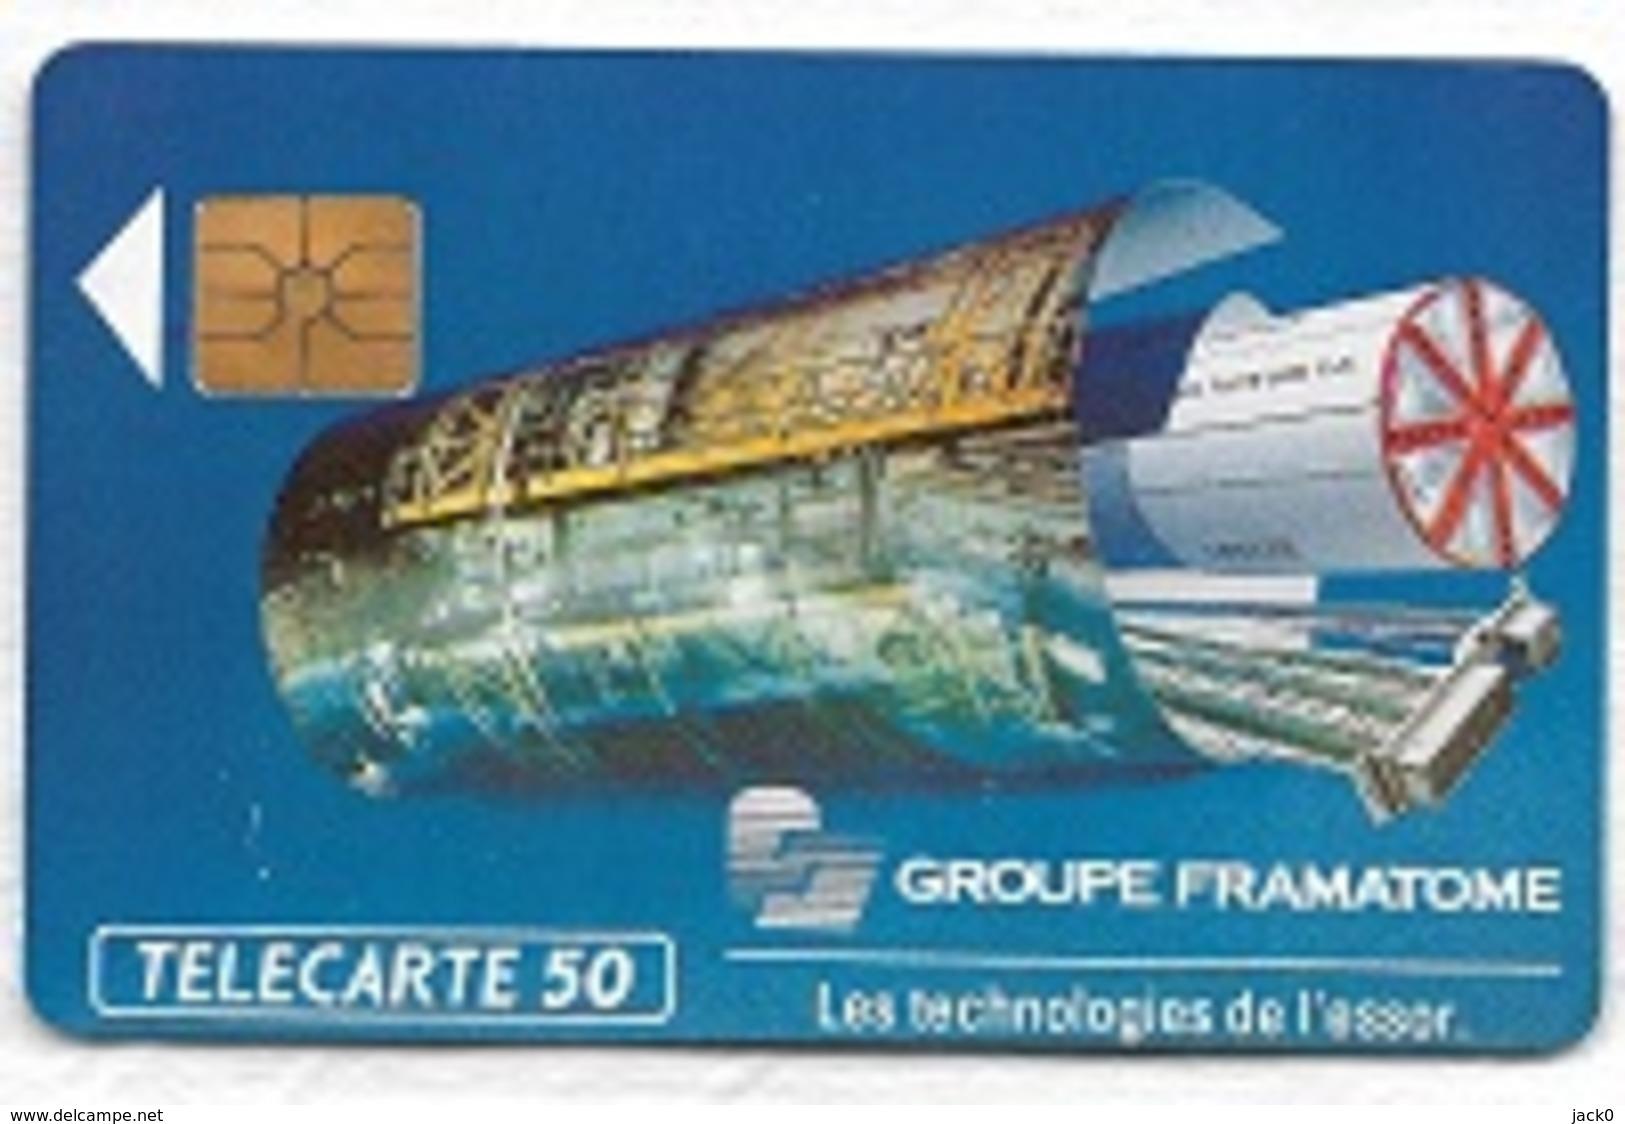 Télécarte  Neuve  50 U, En 244, GROUPE  FRAMATOME 12 / 91  12 000 Ex - France